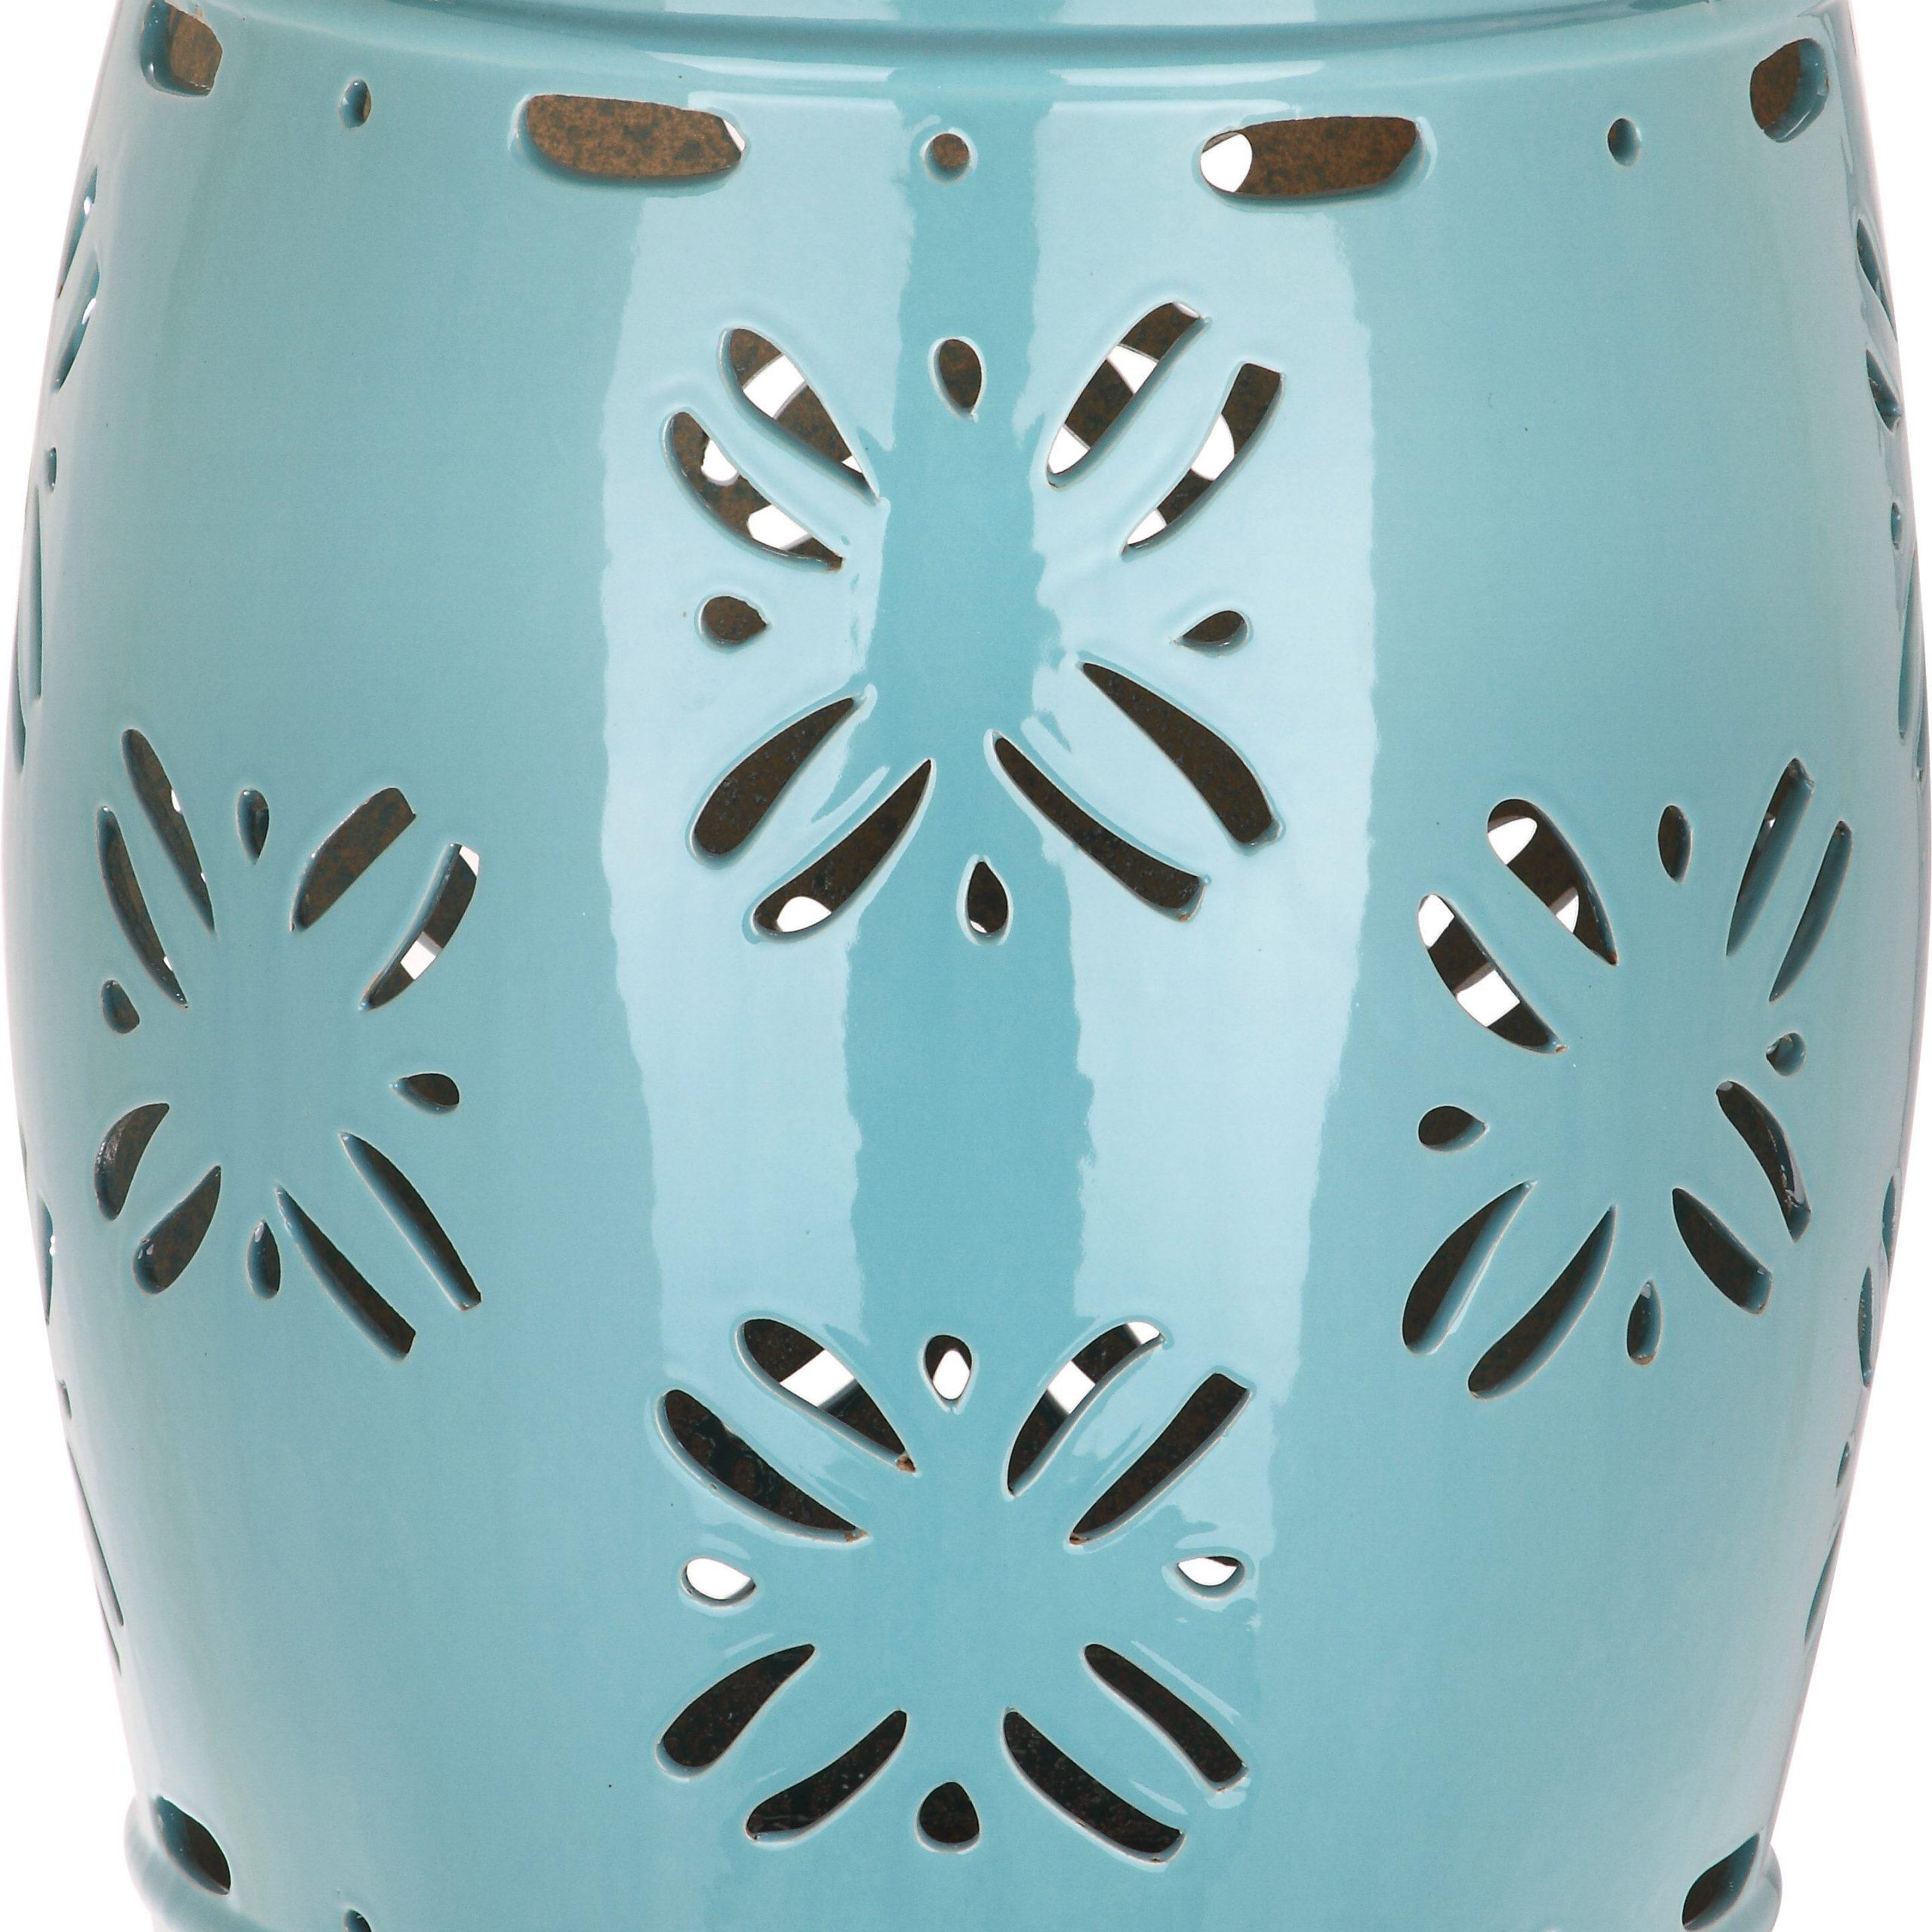 Ceramic Garden Accent Stools You'Ll Love In 2020 | Wayfair Regarding Middlet Owl Ceramic Garden Stools (View 4 of 25)